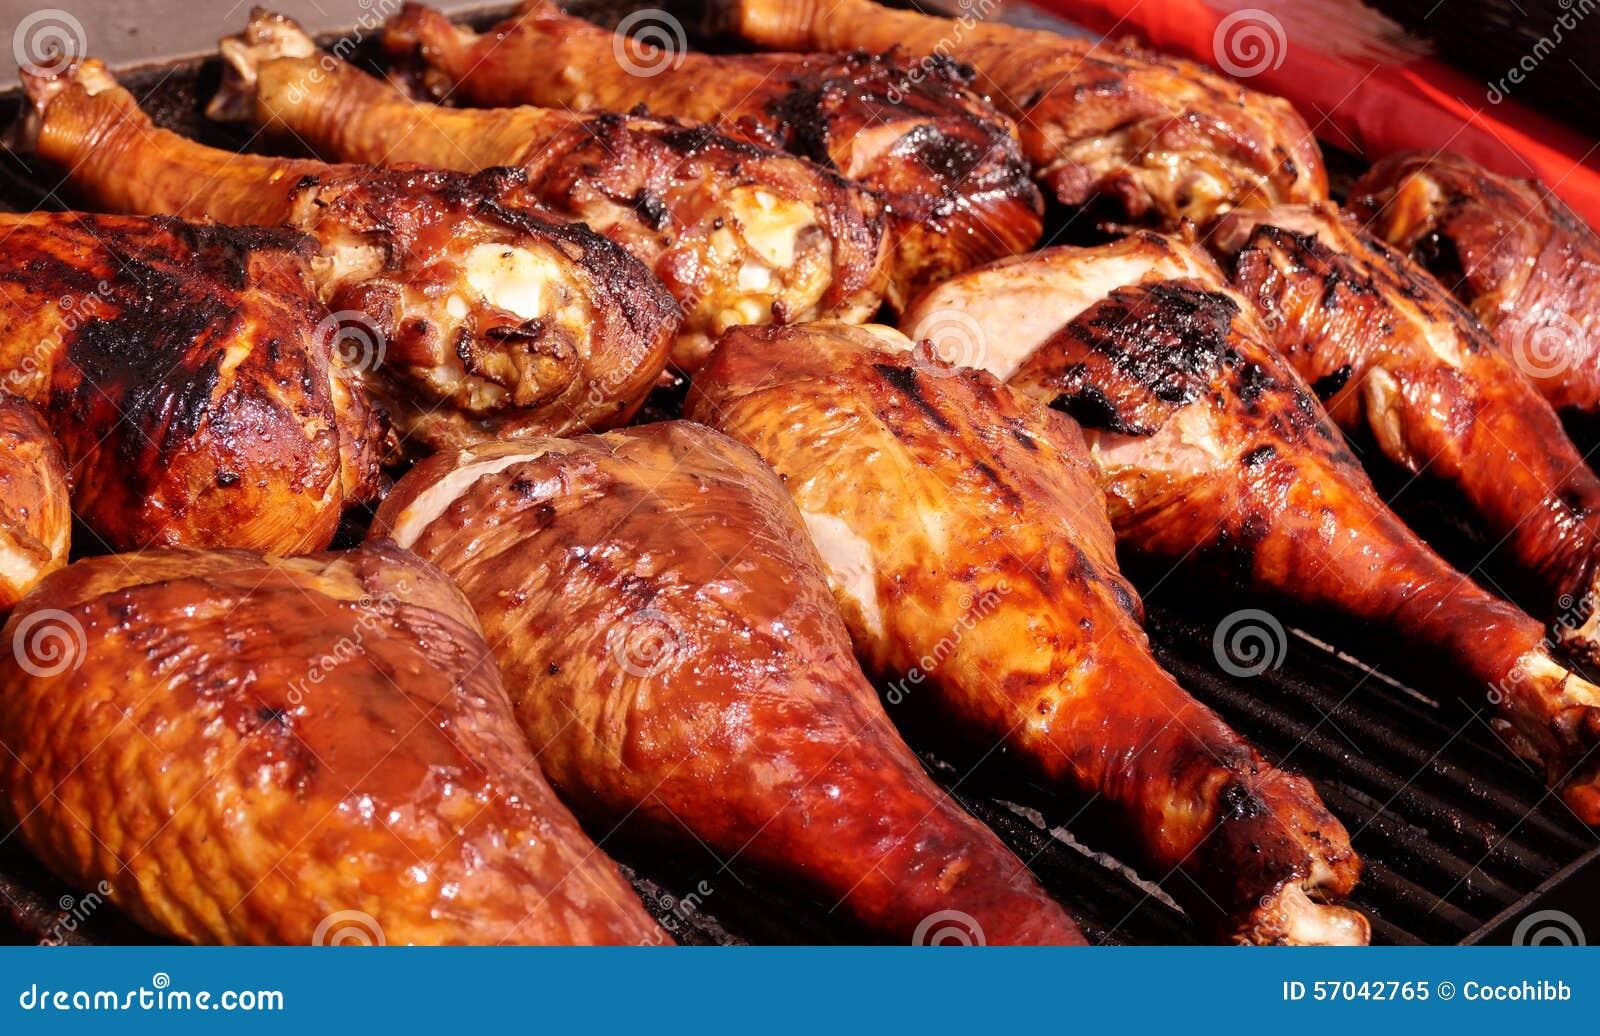 Suncoast BBQ Bash - Event Food